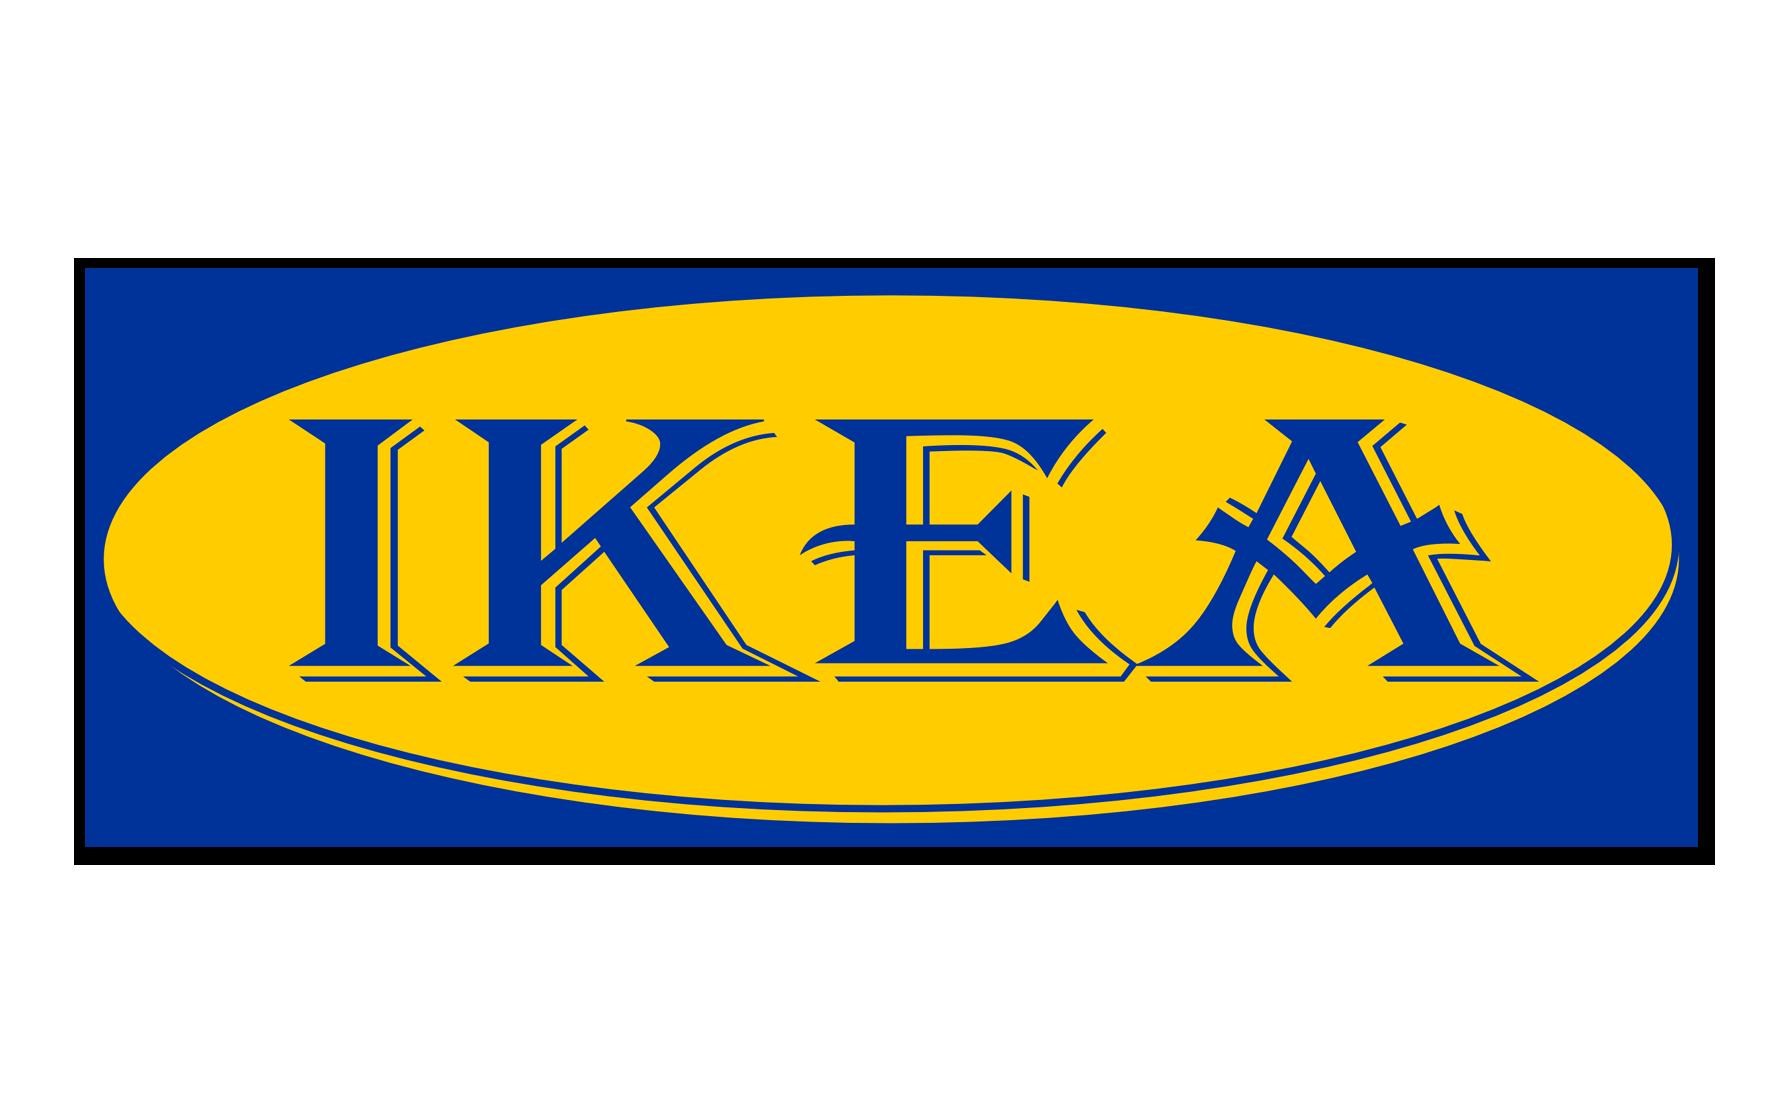 Ikea symbol wallpapers HD